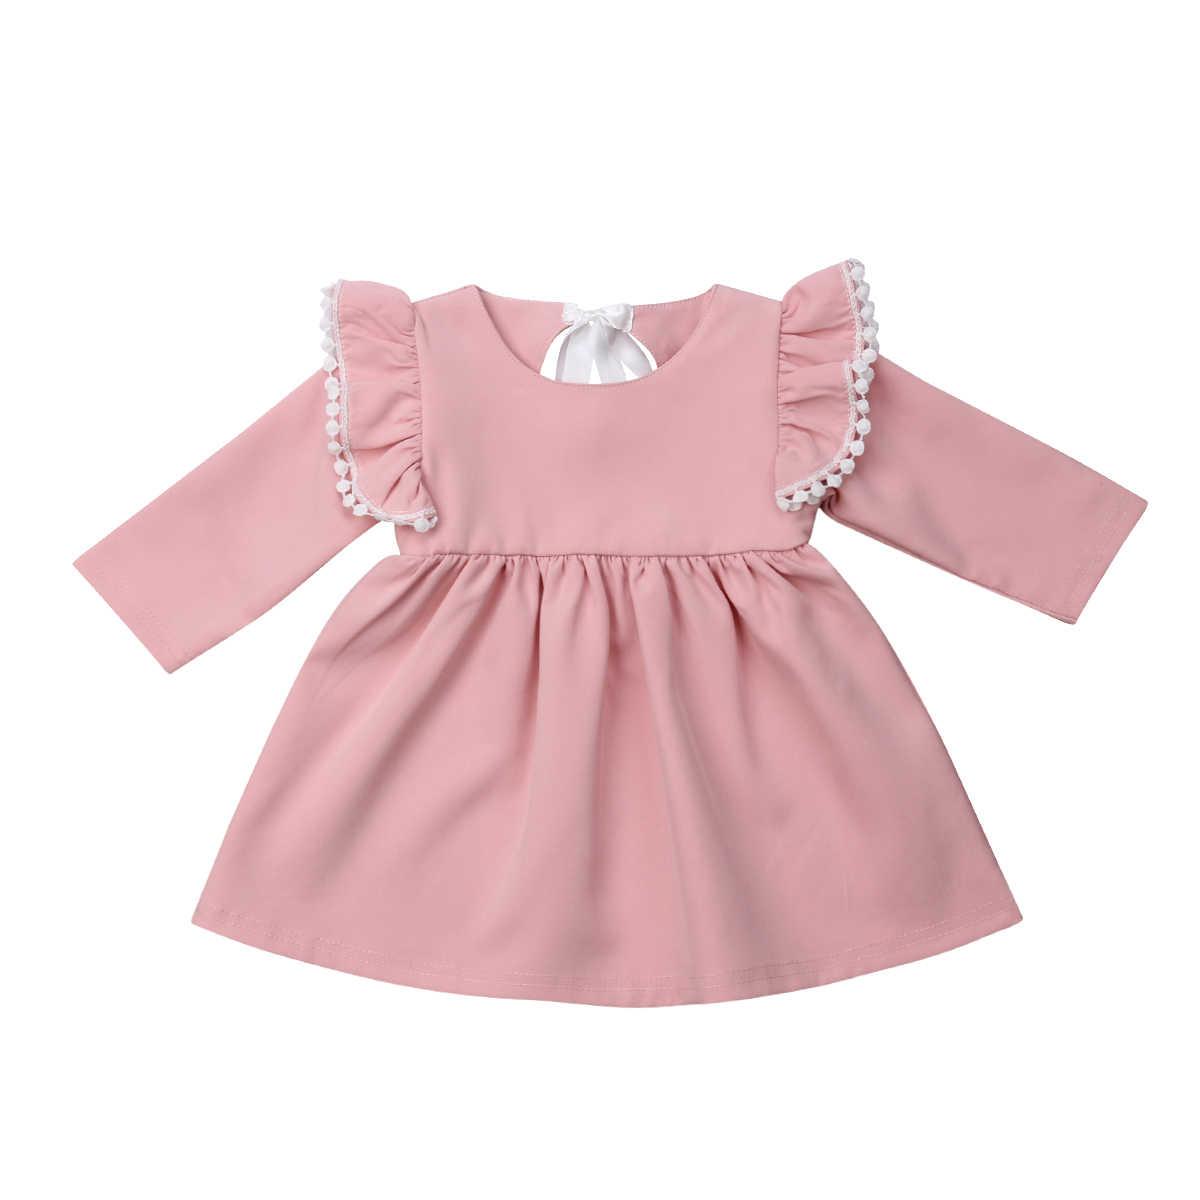 7d8df8a5302 Princess Baby Girls Dress Toddler Girls Long Sleeve Lace Bow Tutu Dresses  Party Wedding birthday Dress